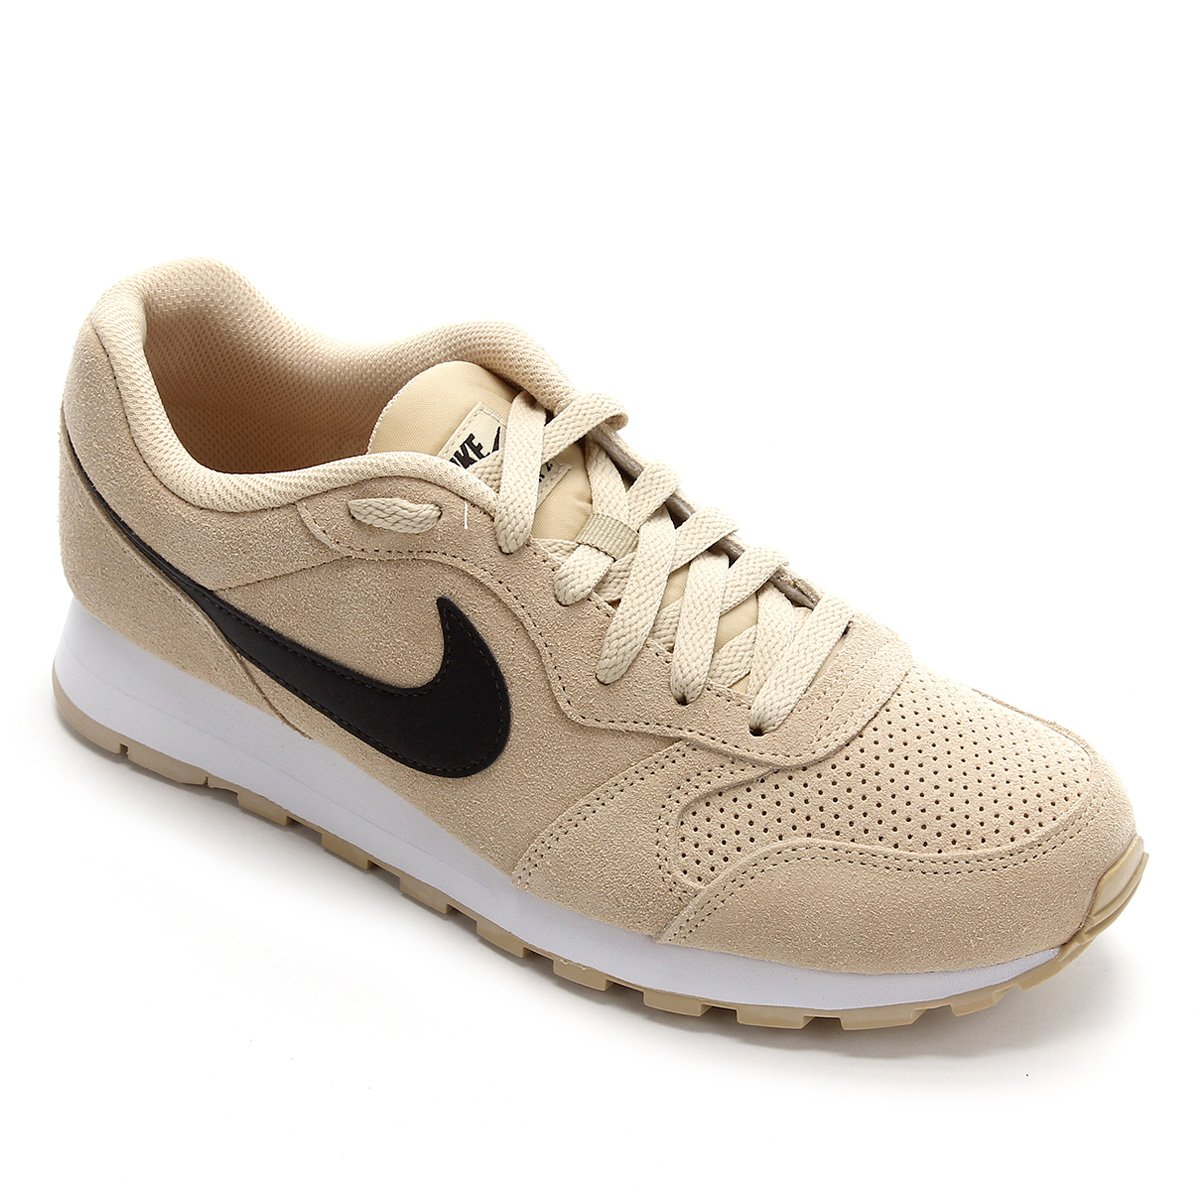 Tênis Nike Md Runner 2 Suede Masculino - Tam: 43